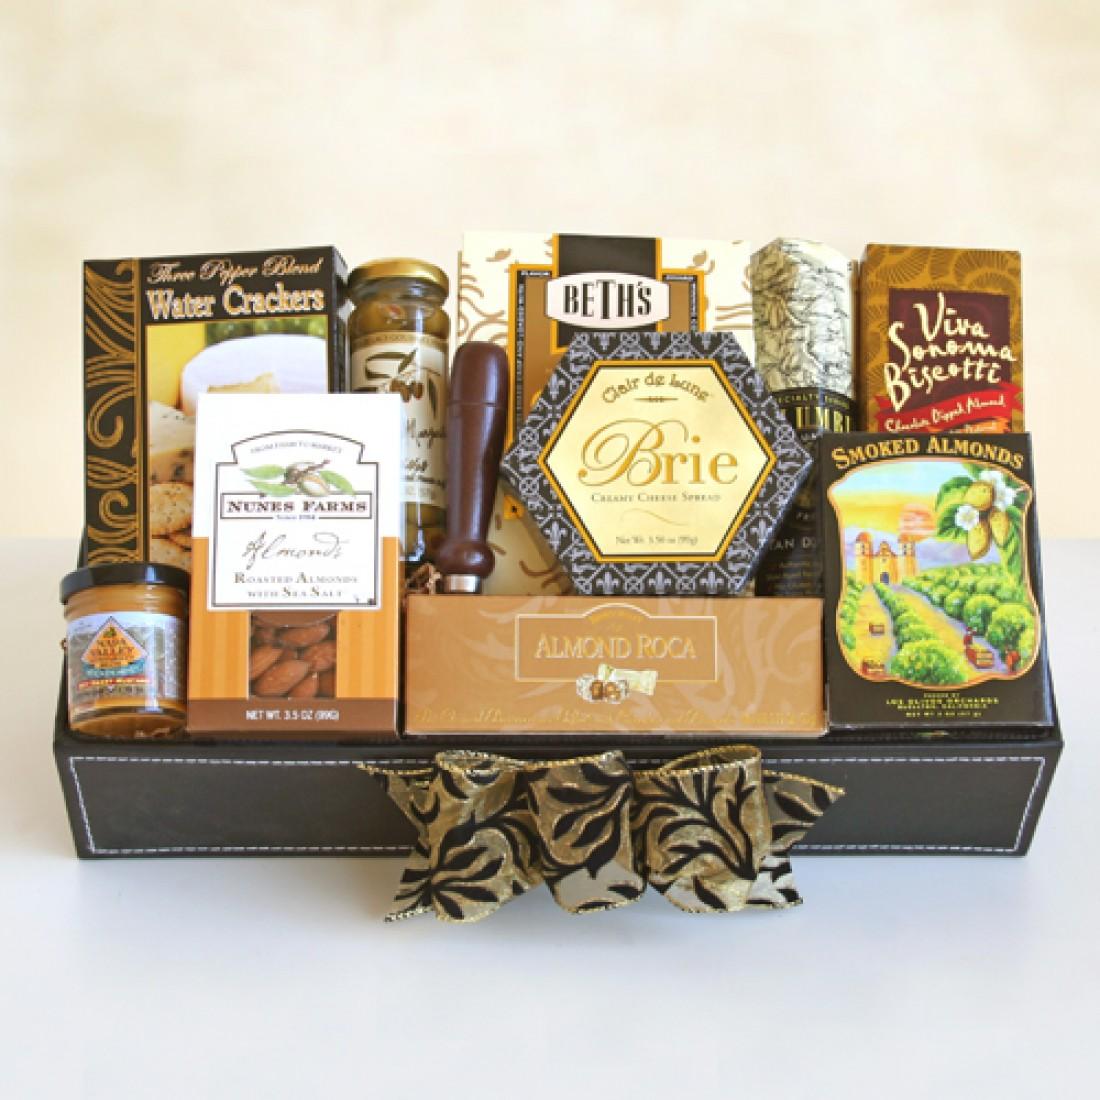 Classic Gourmet Gift Boxes  sc 1 st  Print EZ & Classic Gourmet Gift Boxes 9526 At Print EZ.